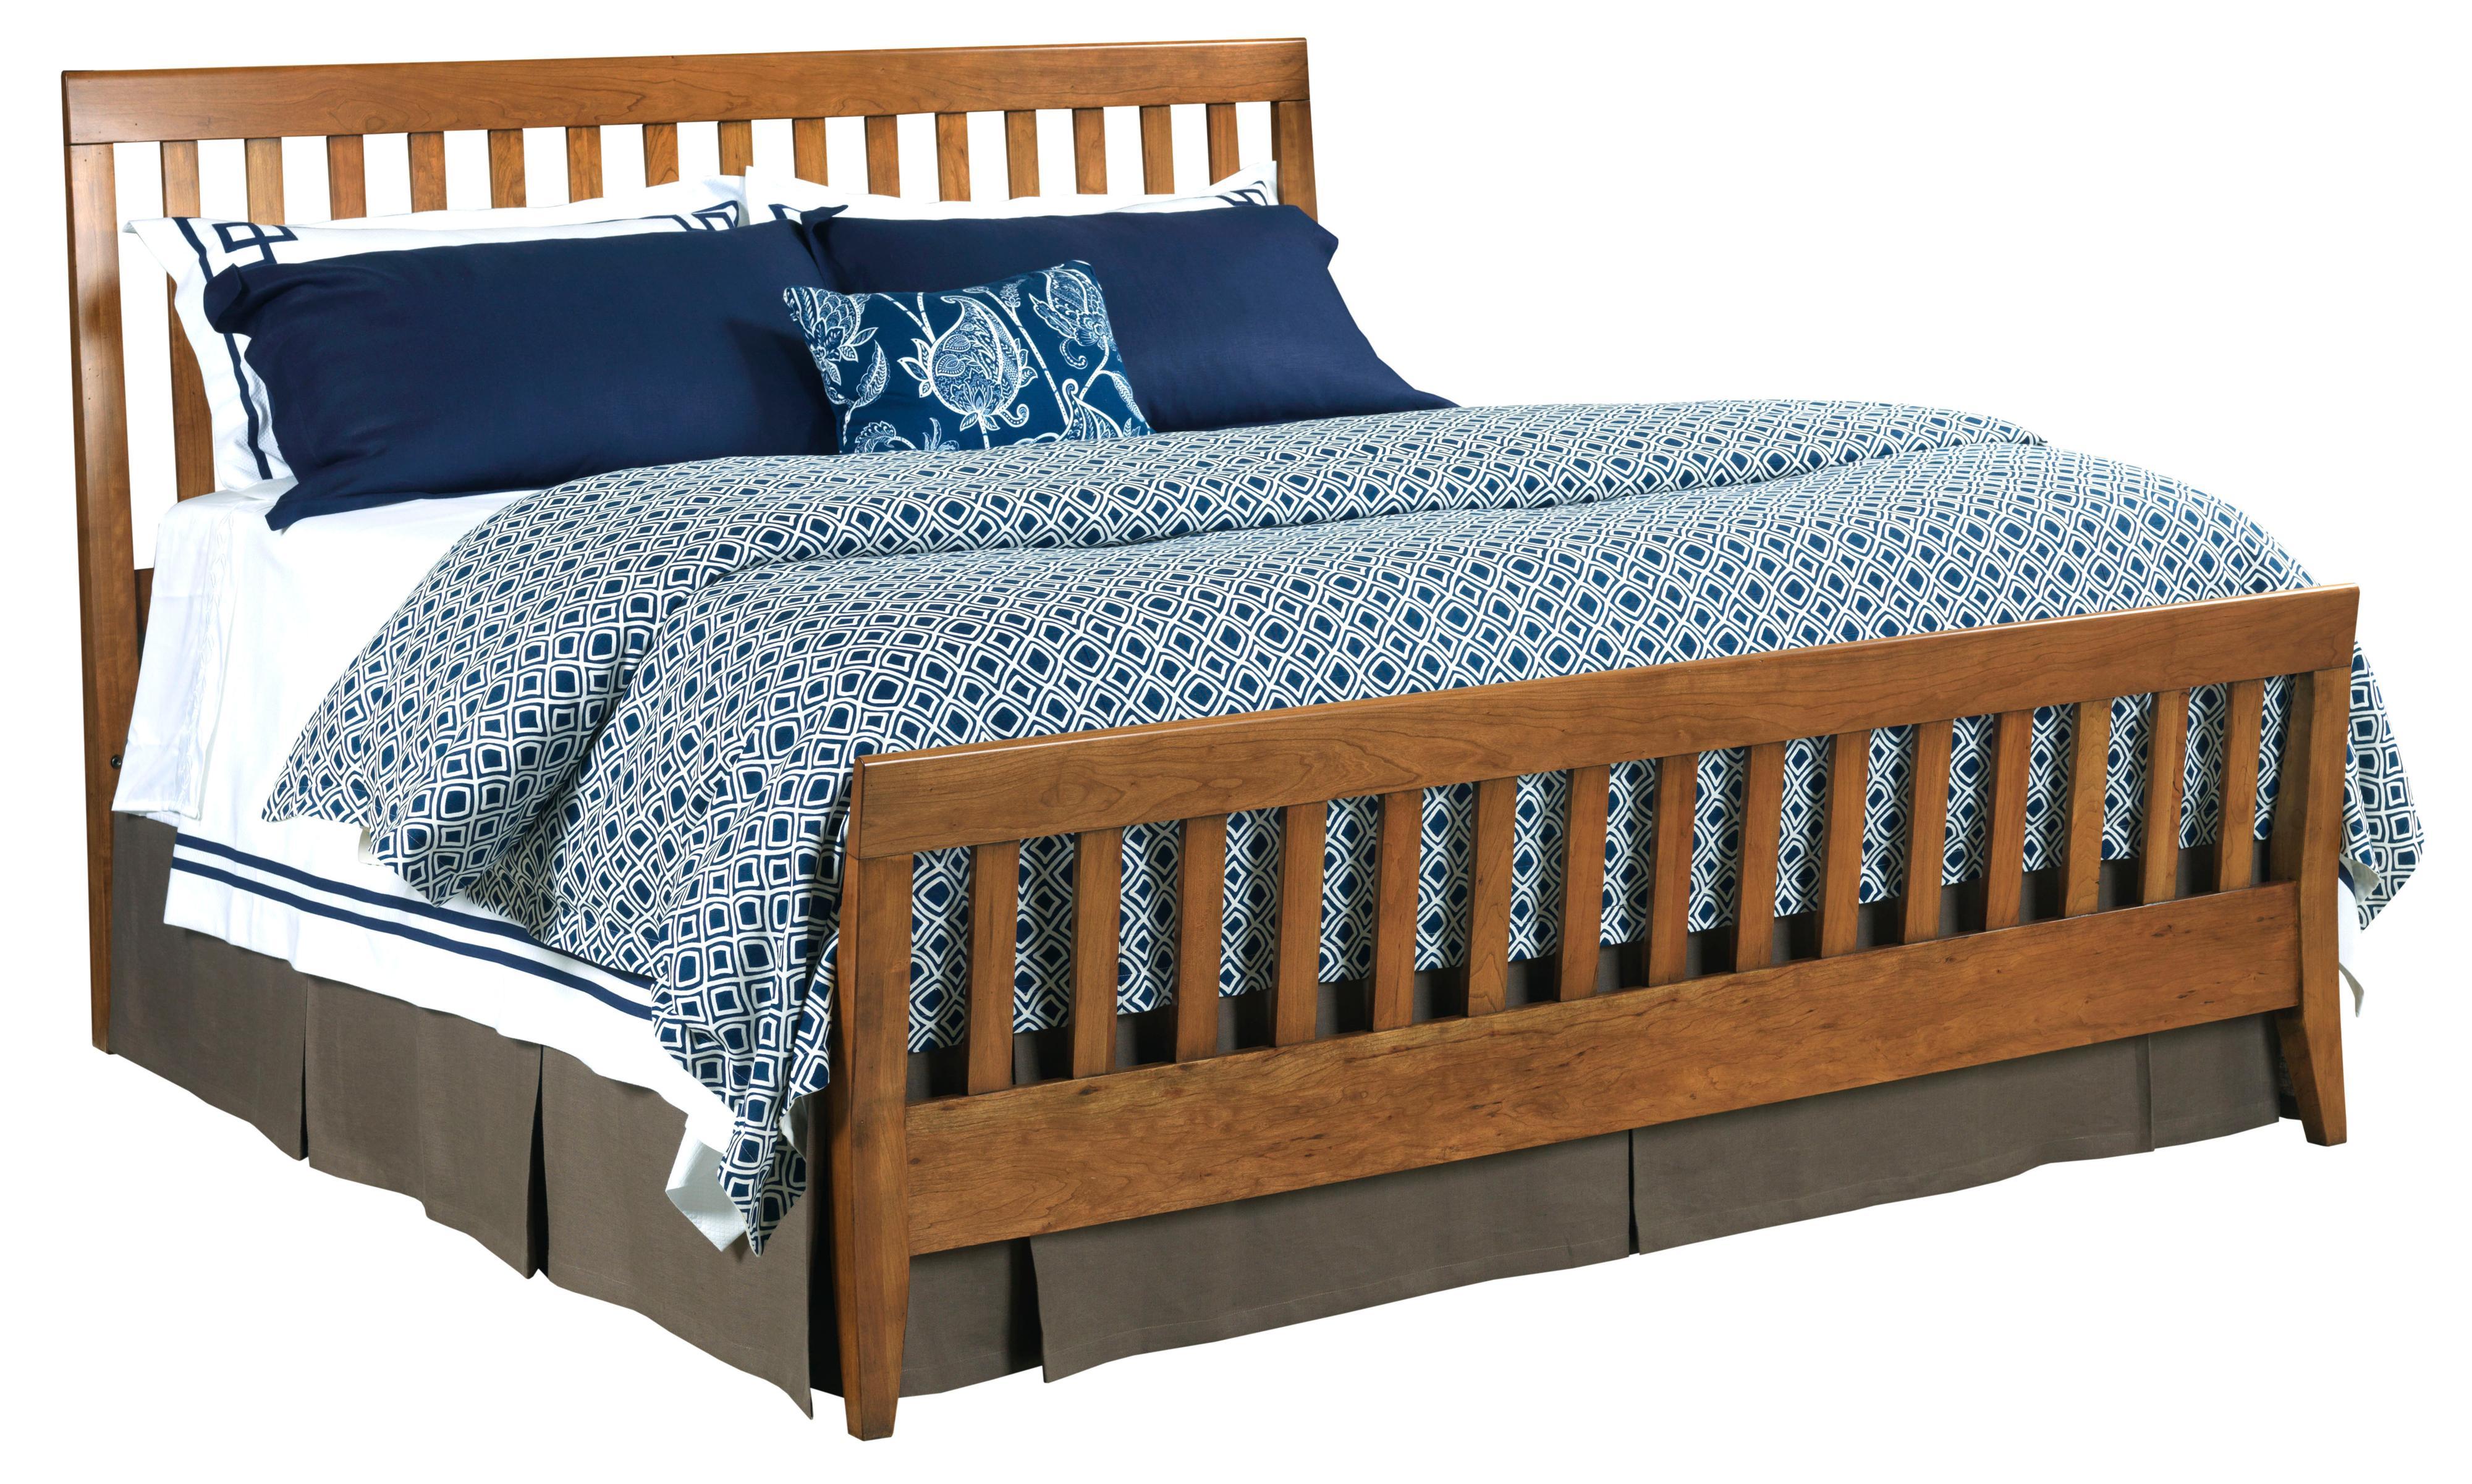 Kincaid Furniture Gatherings King Slat Bed - Item Number: 44-2810